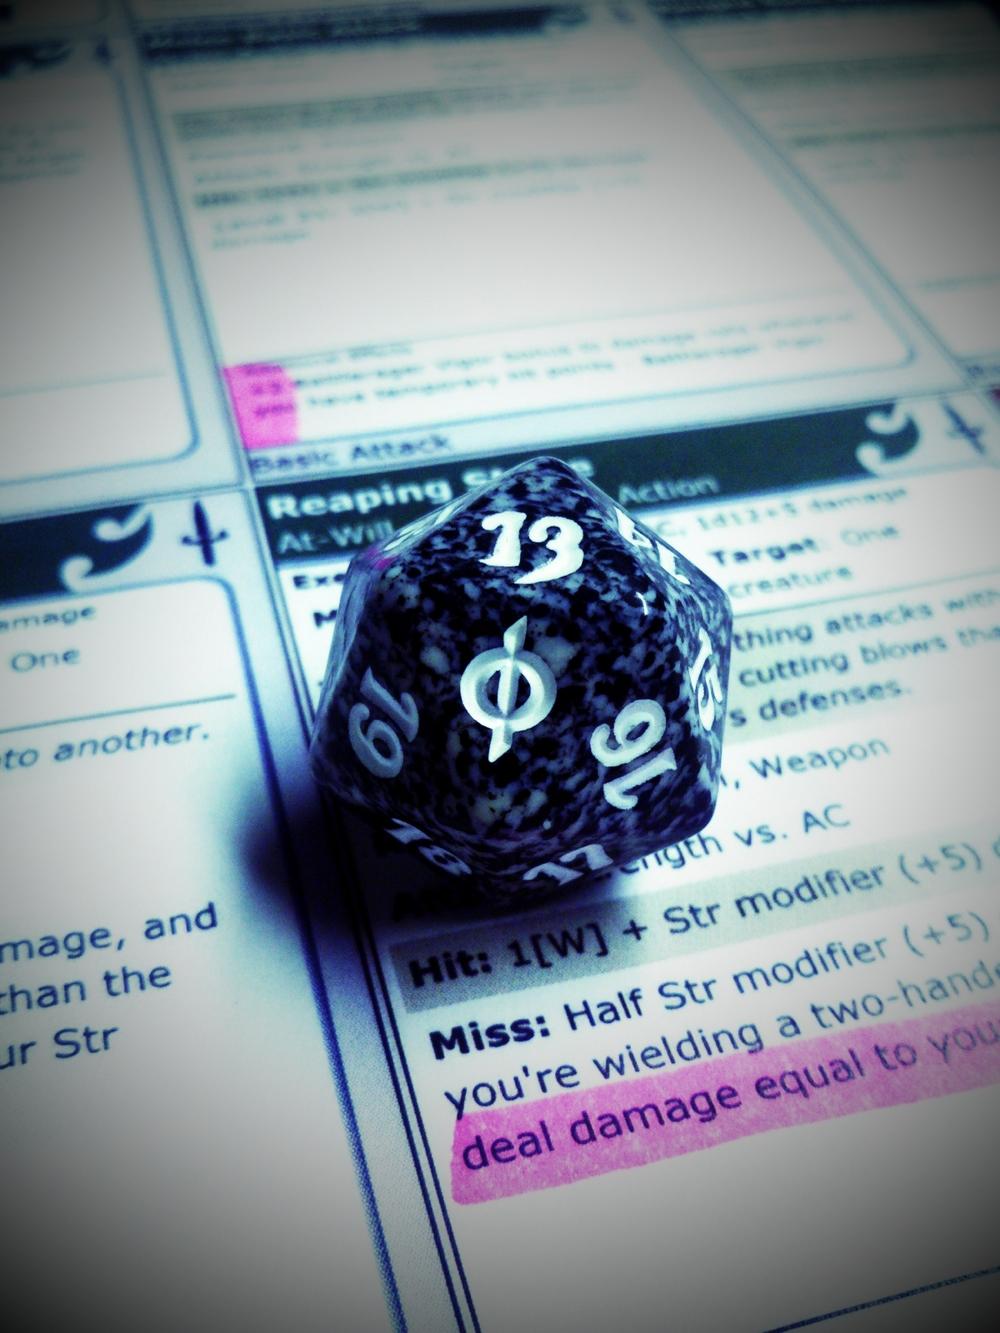 C360_2011-08-22 23-04-35.jpg